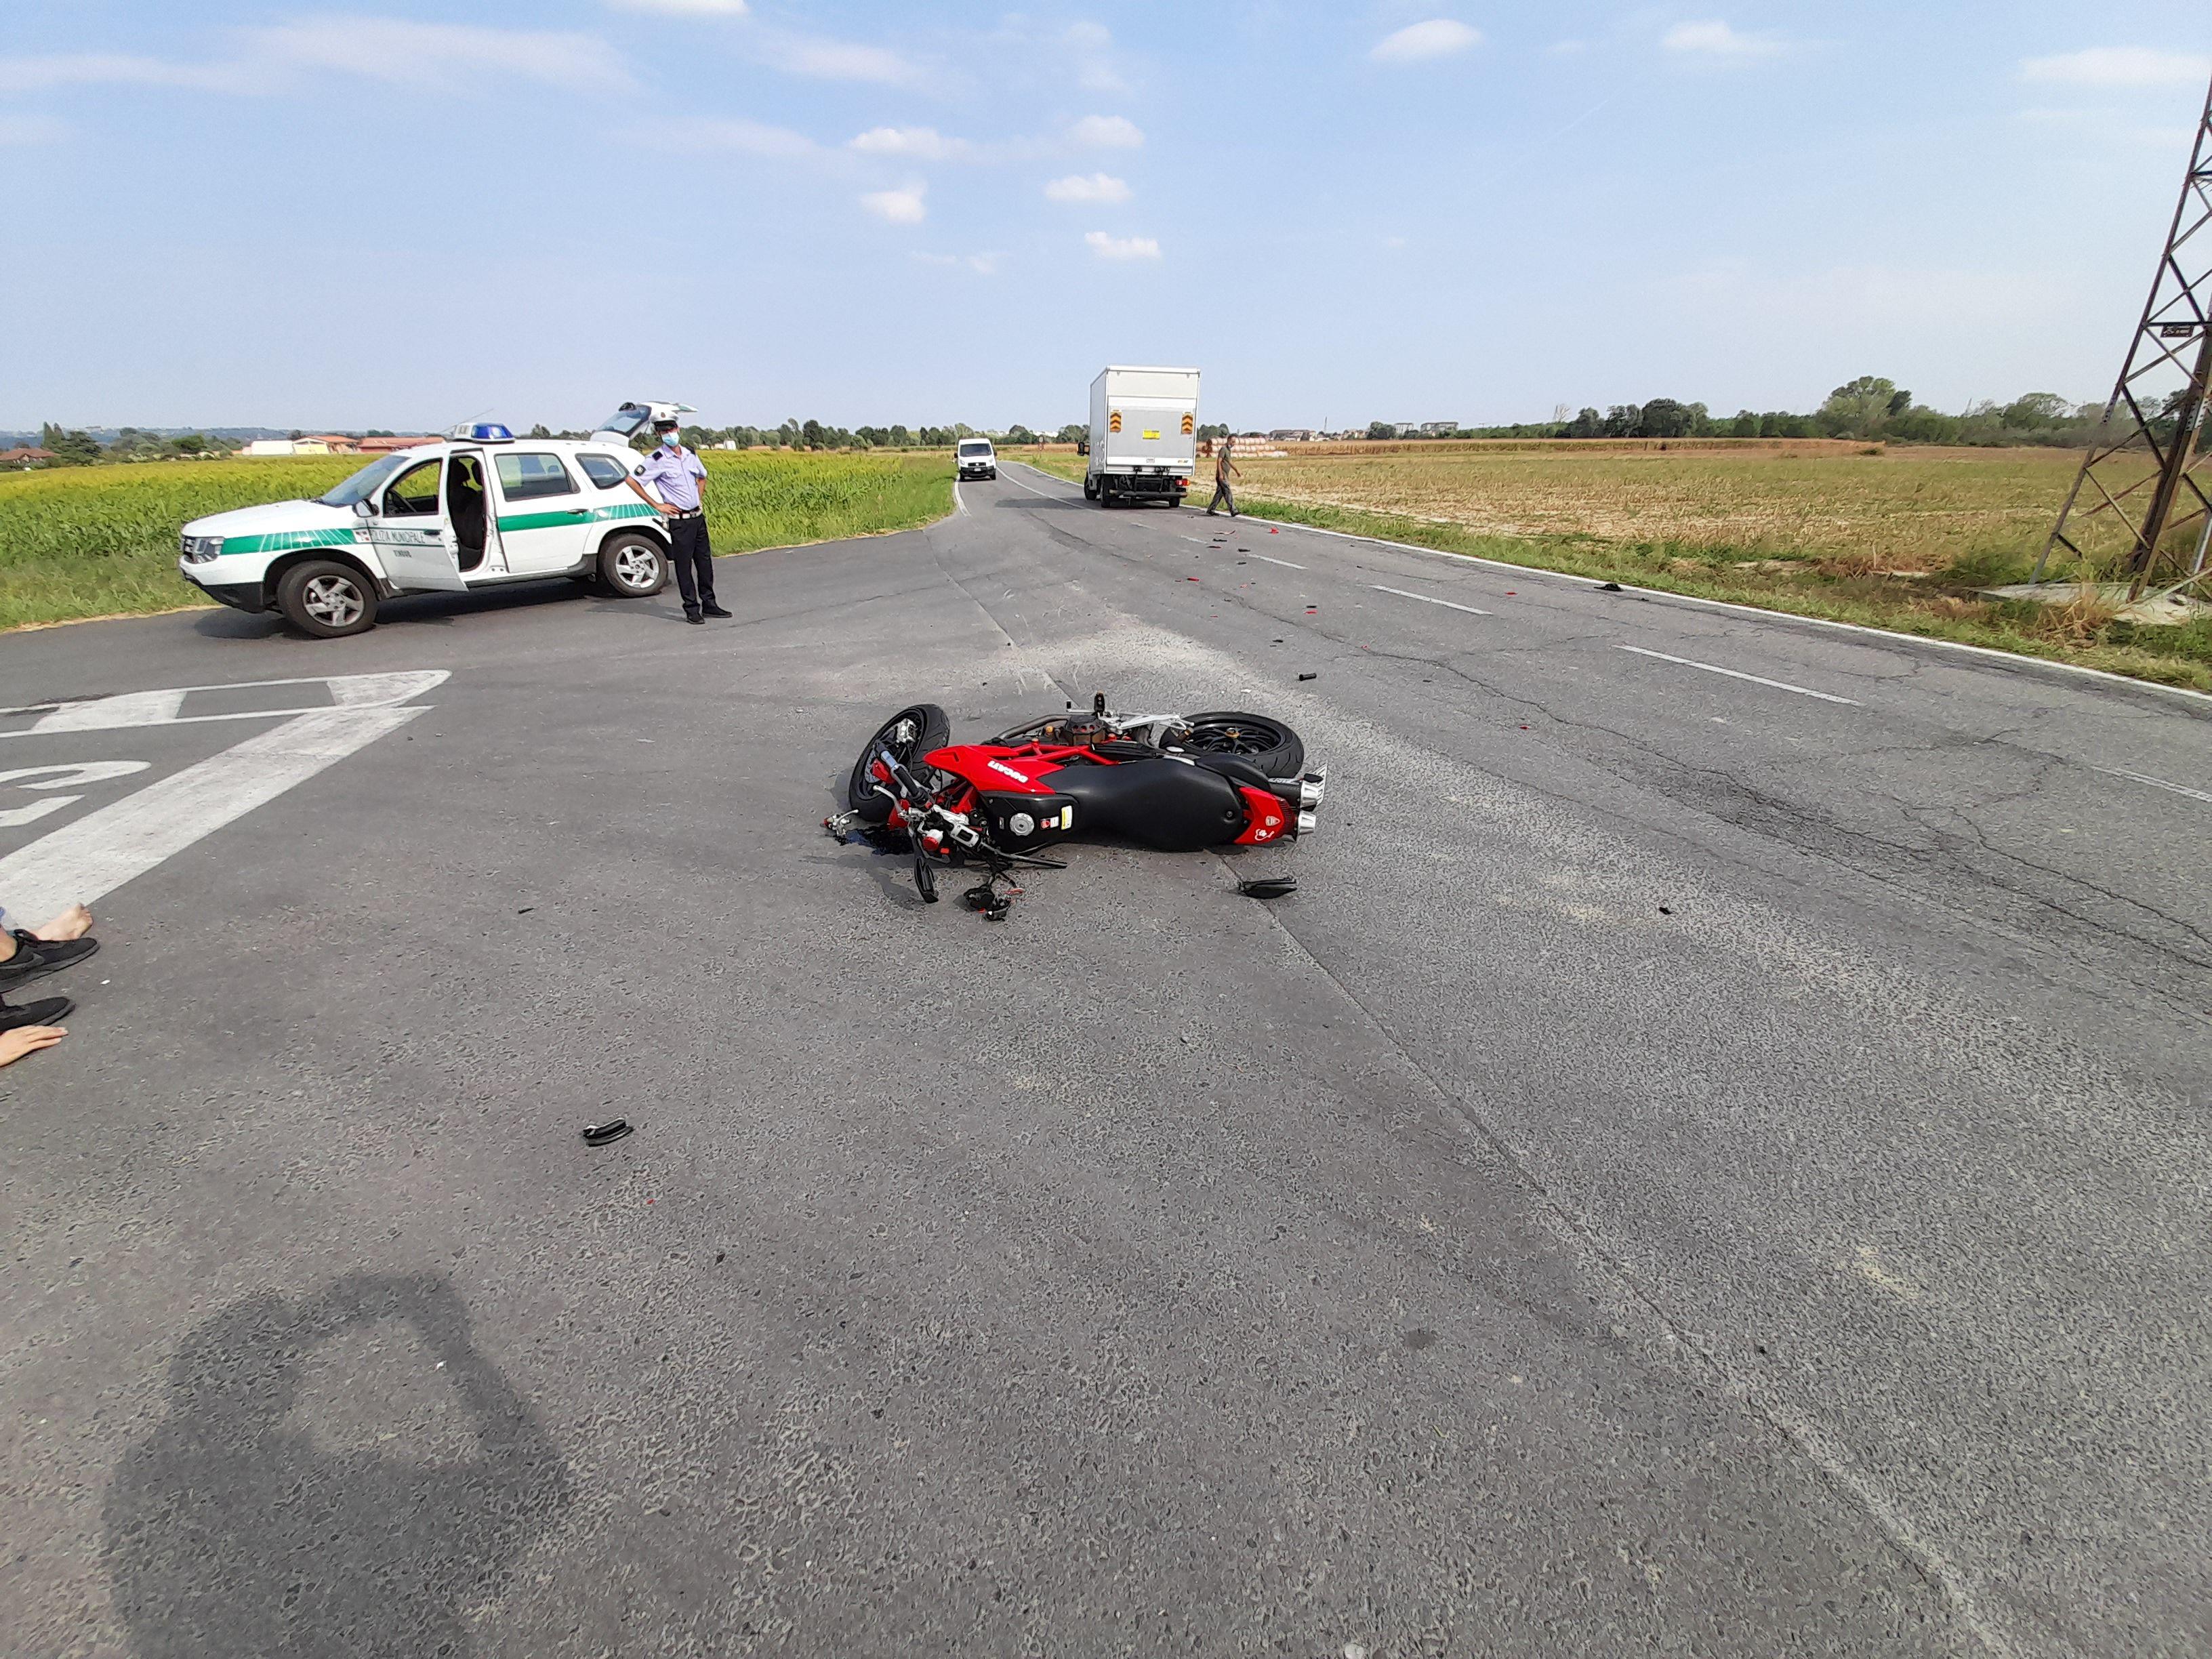 VINOVO - Grave incidente in strada MOncalieri